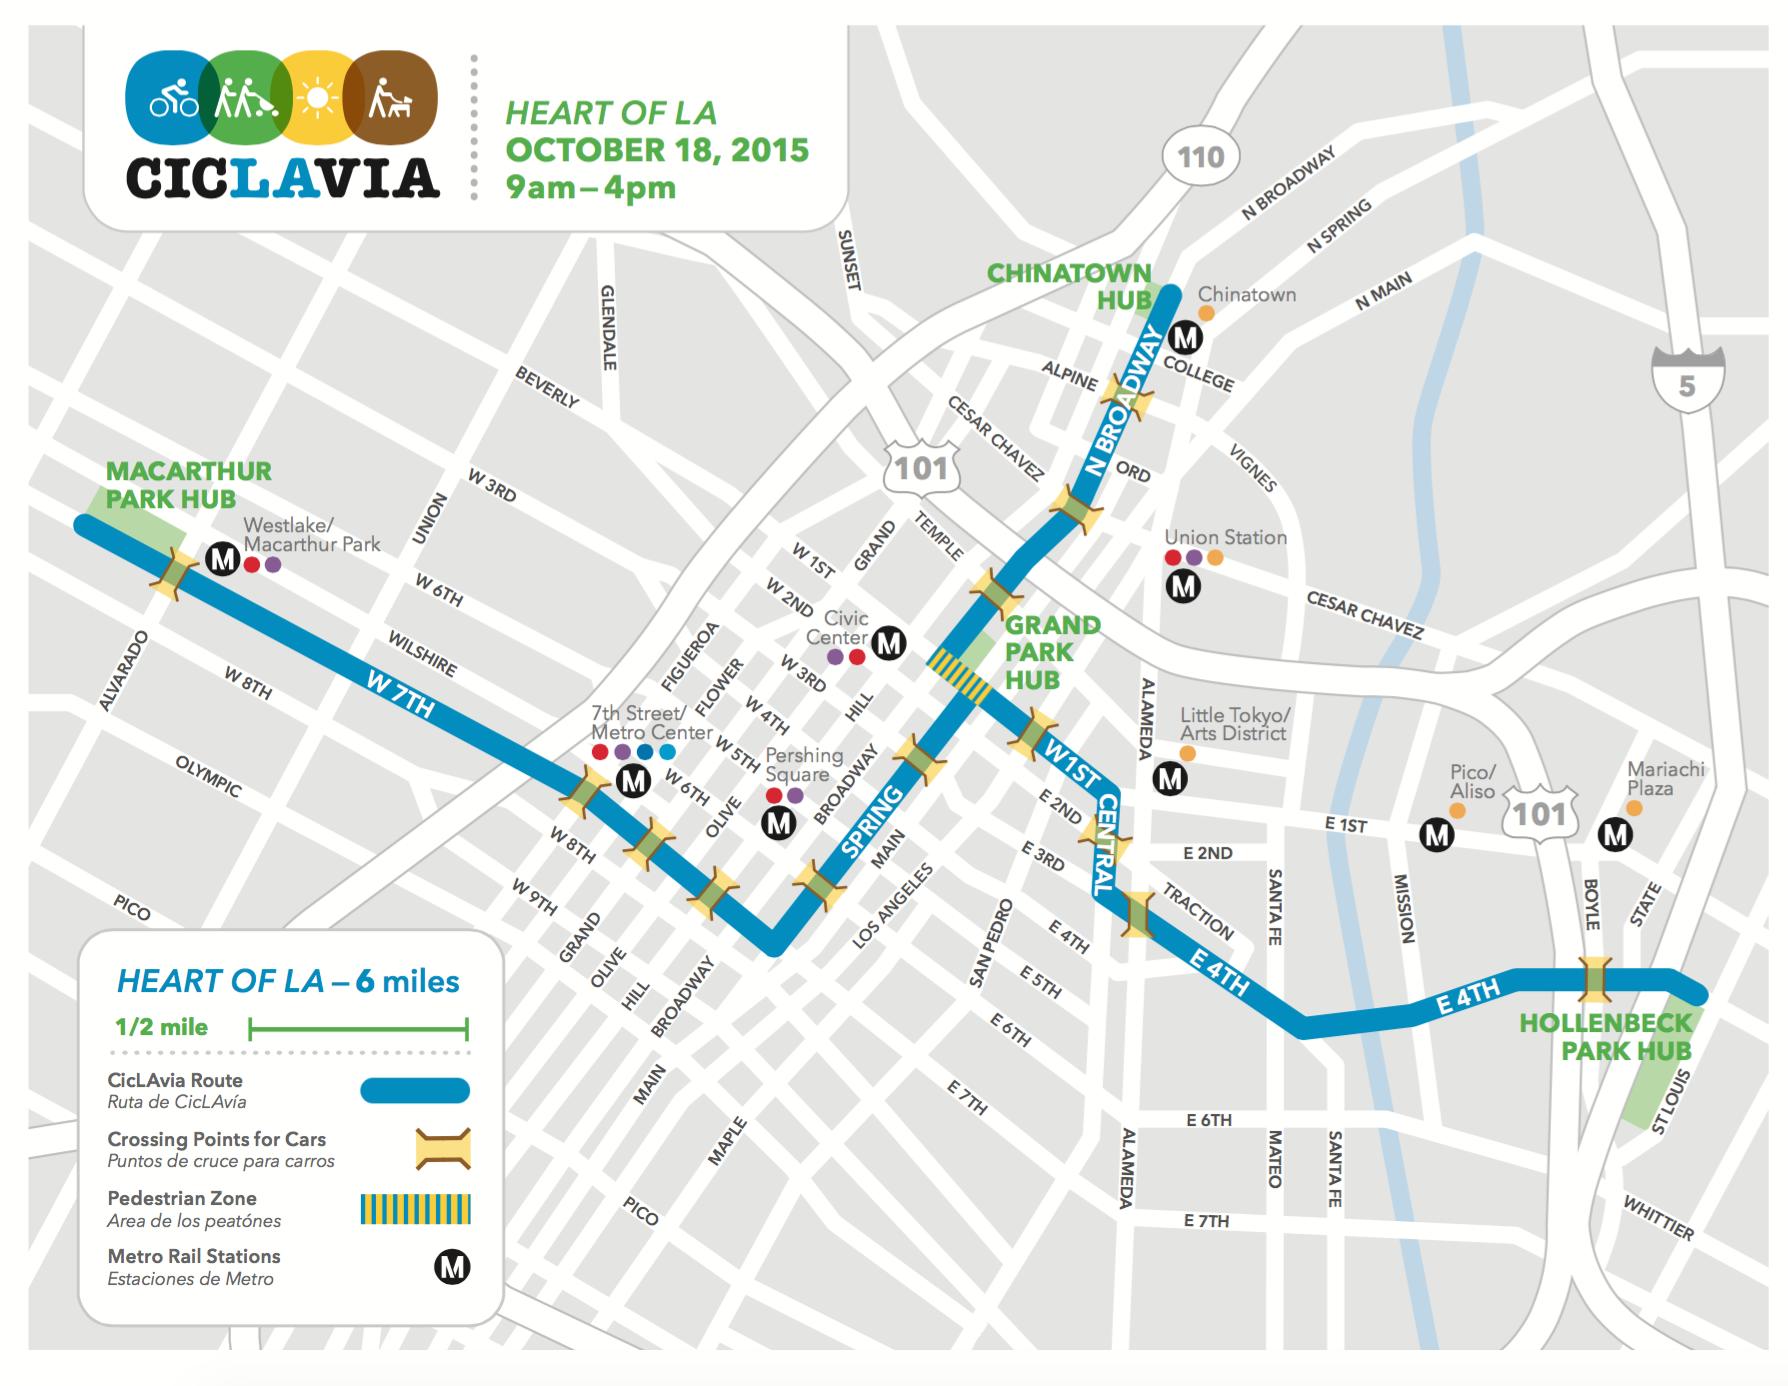 ciclavia map 2015